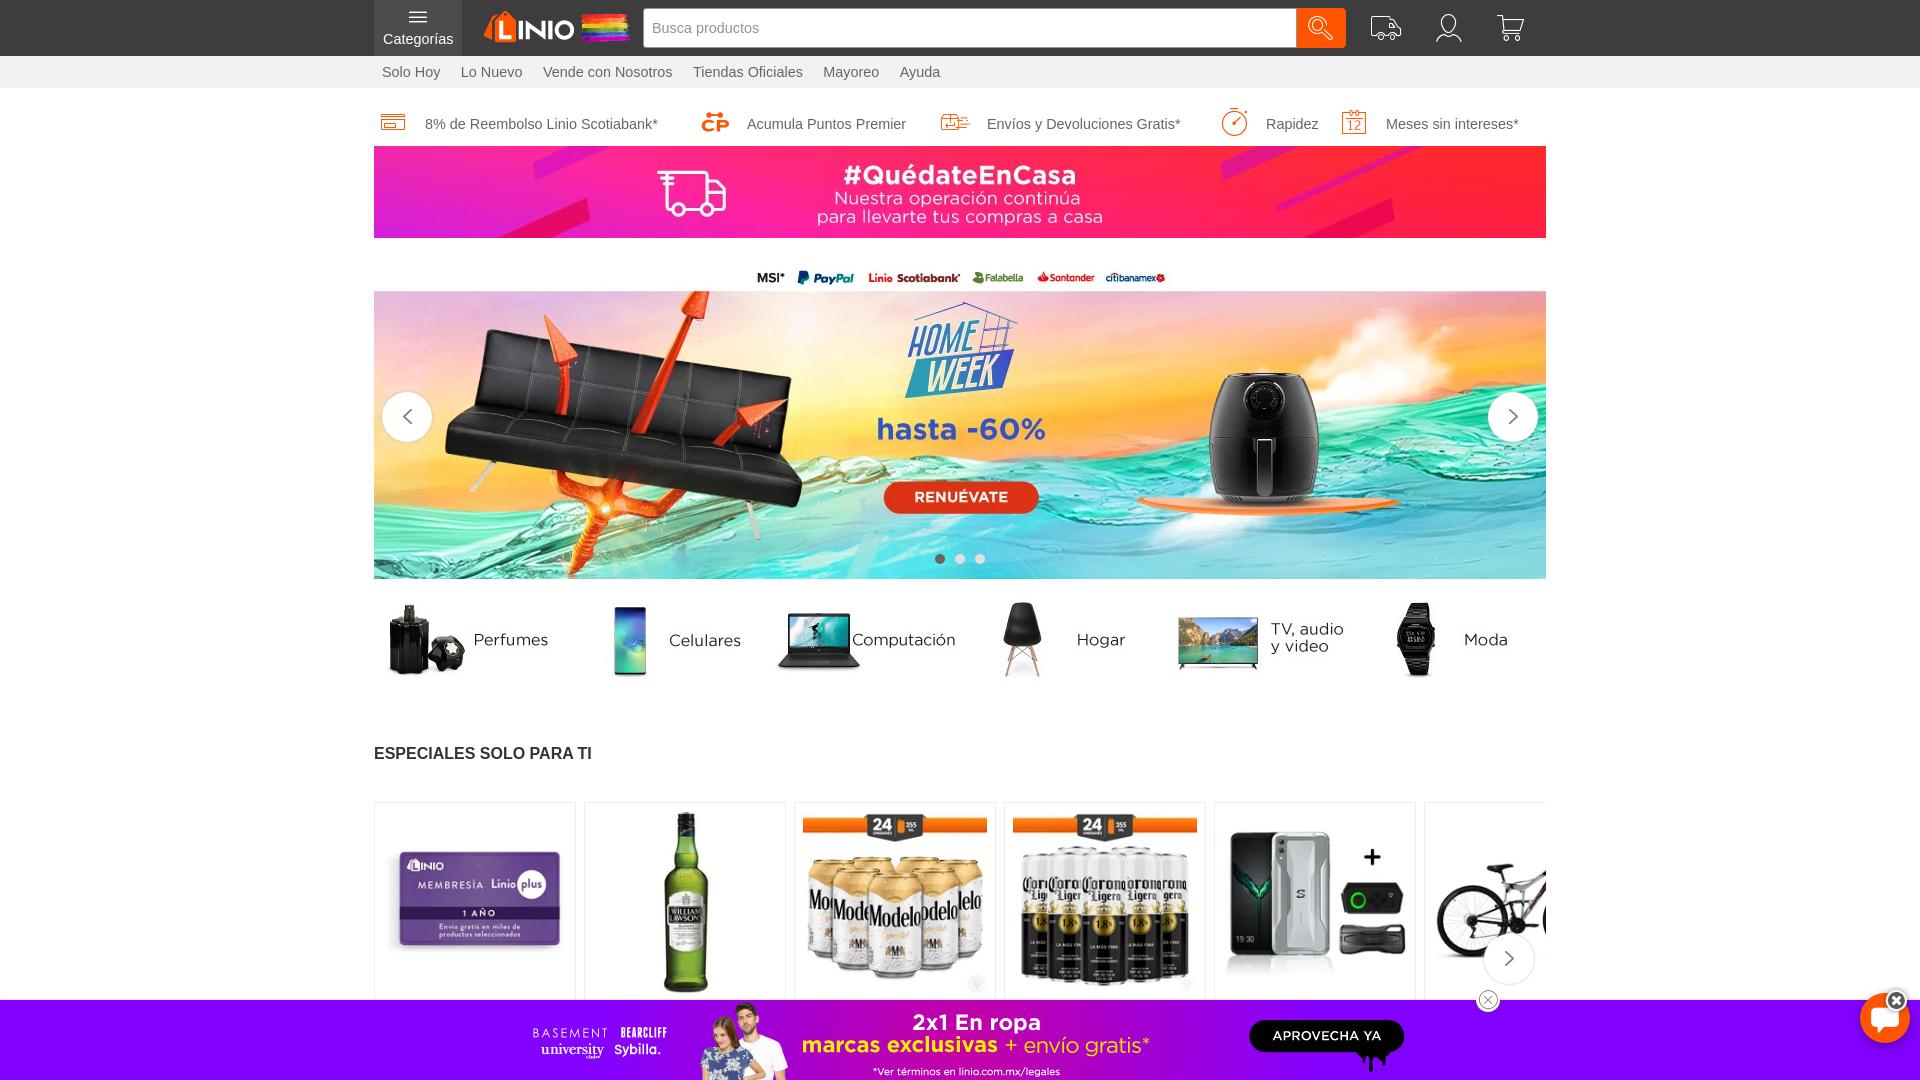 Linio Mexico website